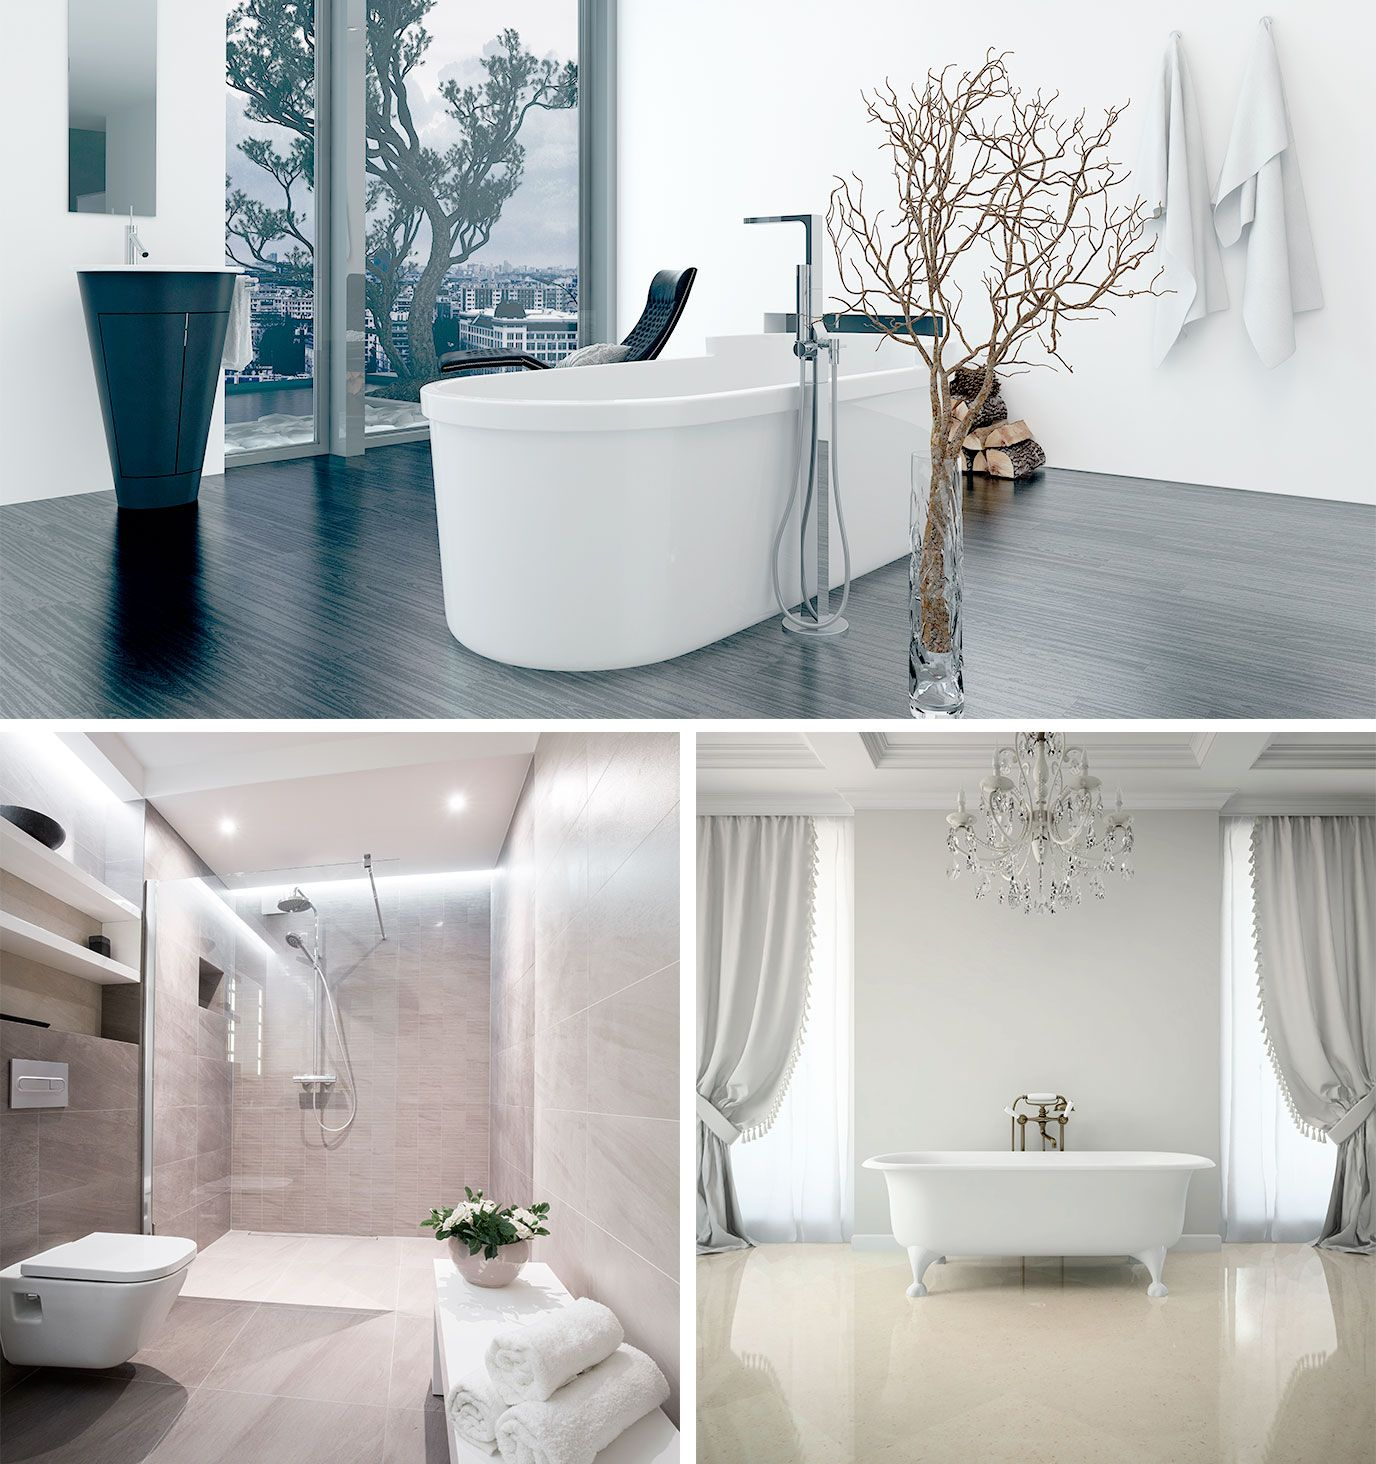 bathroom design Edinburgh City Renovations provide Premium Home Renovation service in Edinburgh and East Lothian